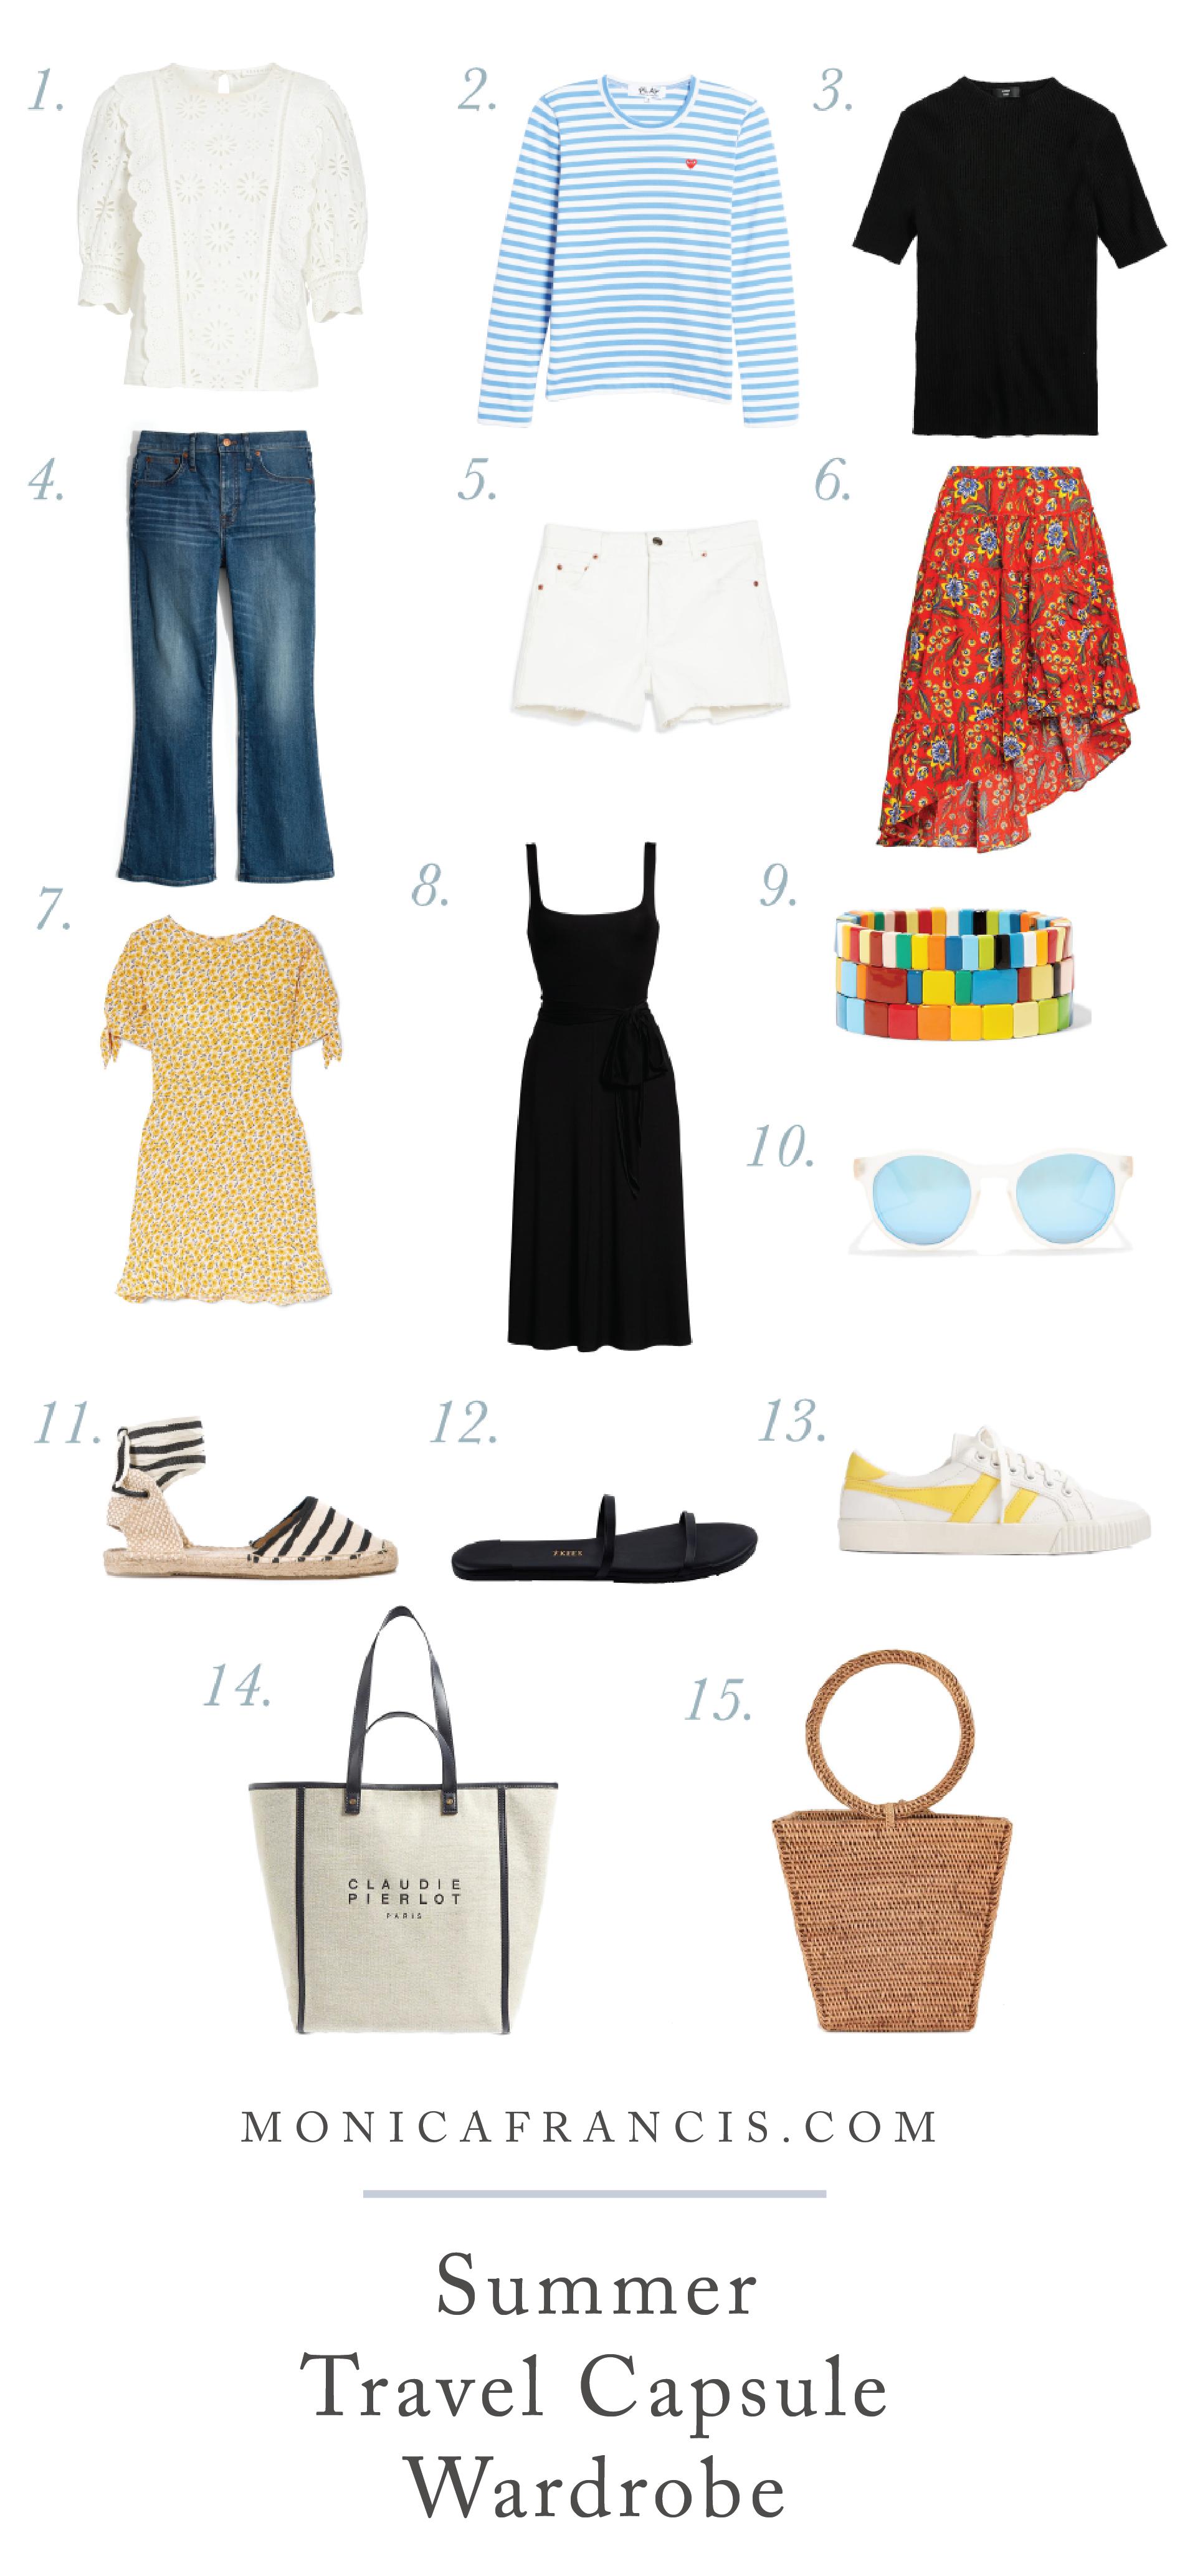 How to Pack a Travel Capsule Wardrobe #travelwardrobesummer